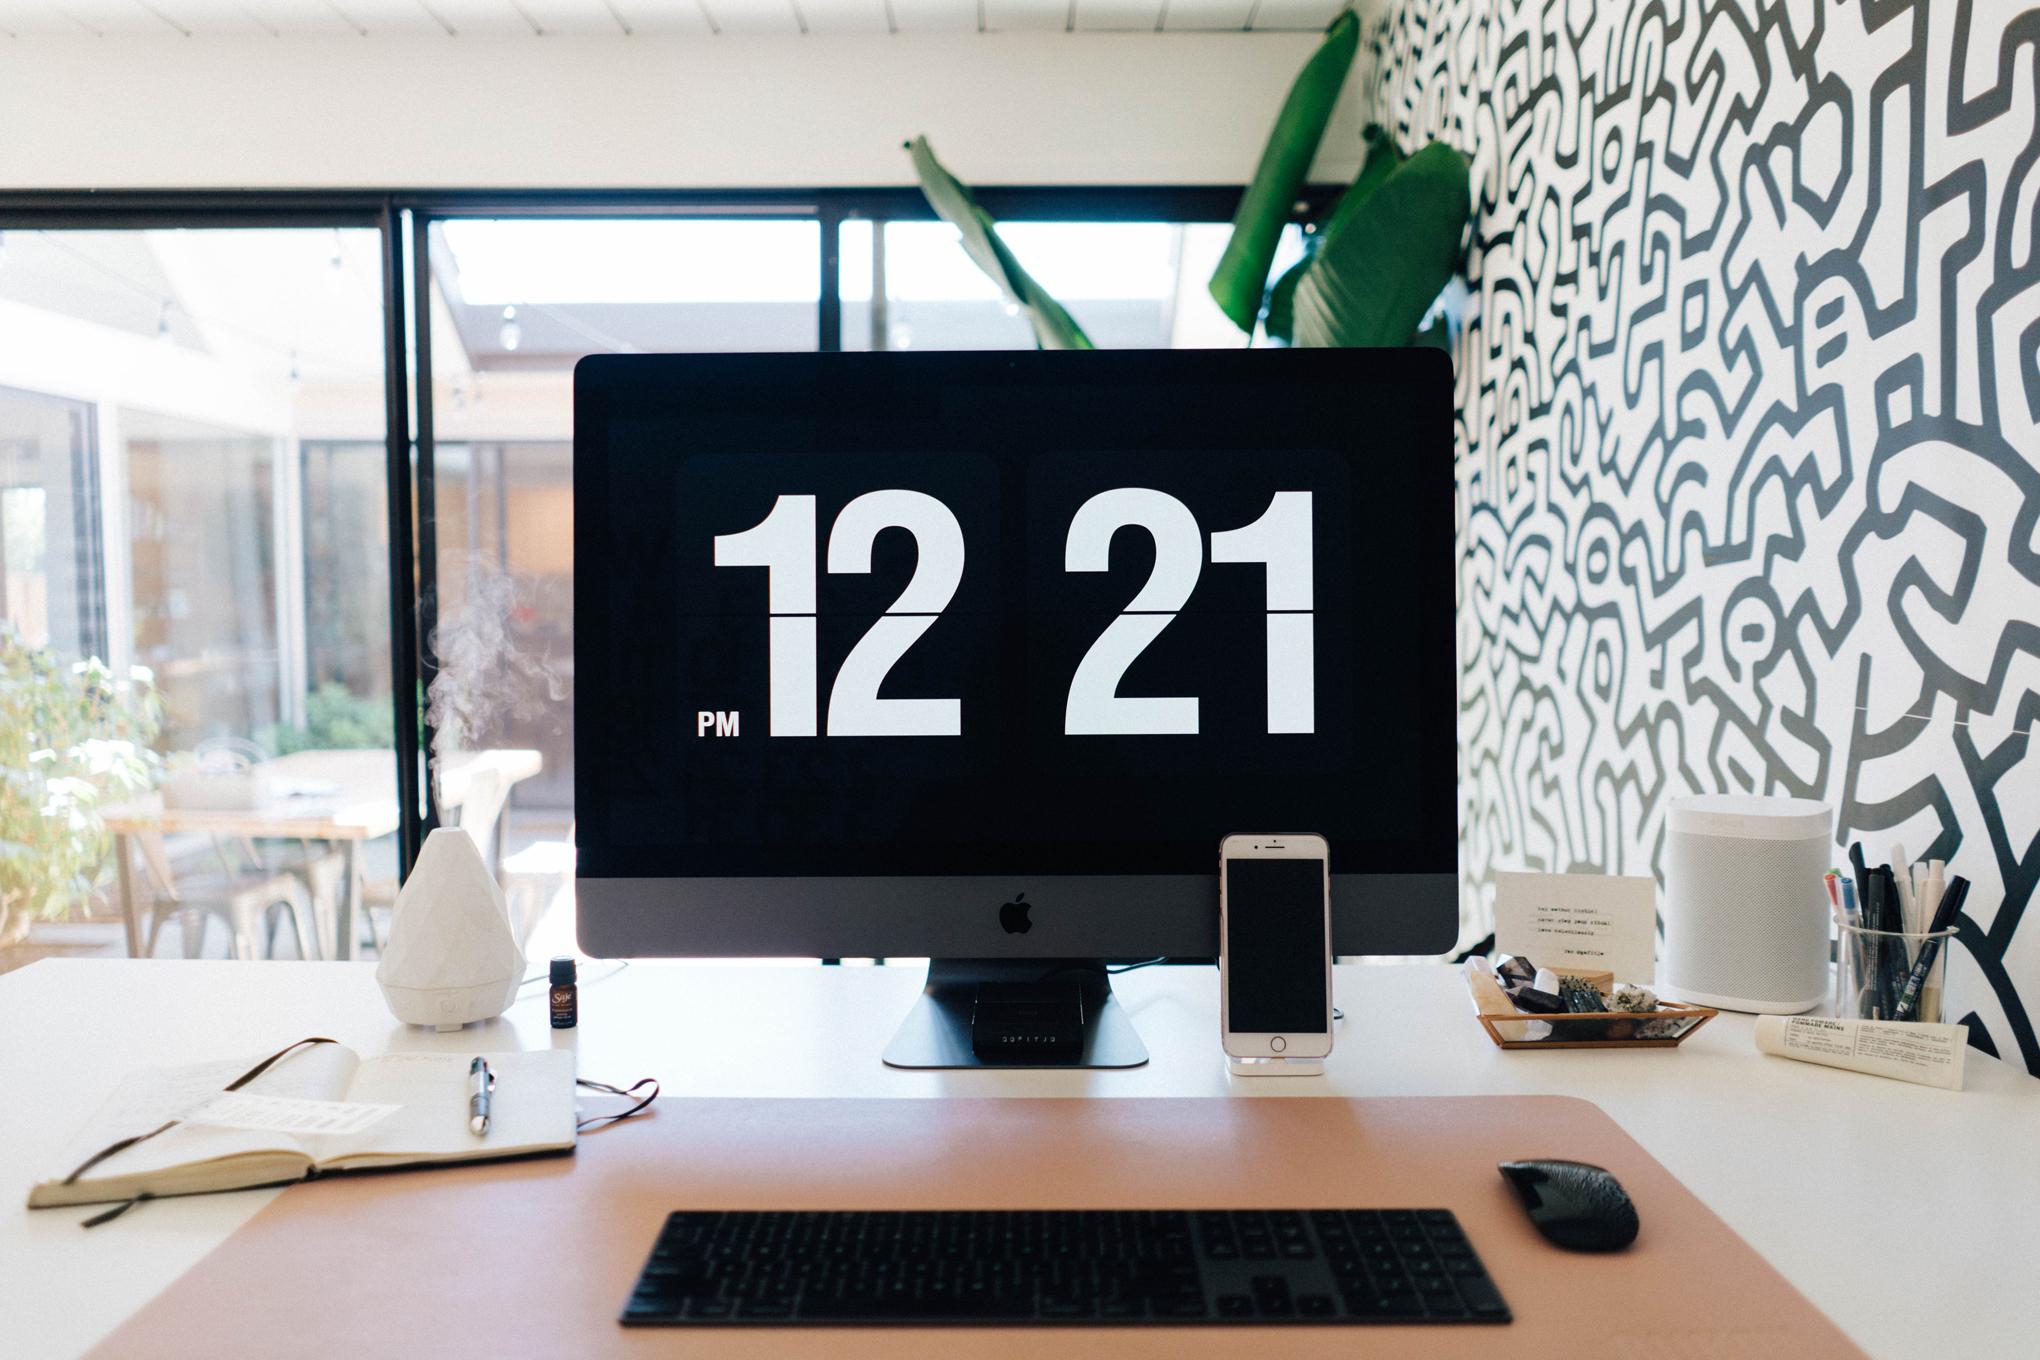 the desktop clock is called Fliqlo. Download it here.